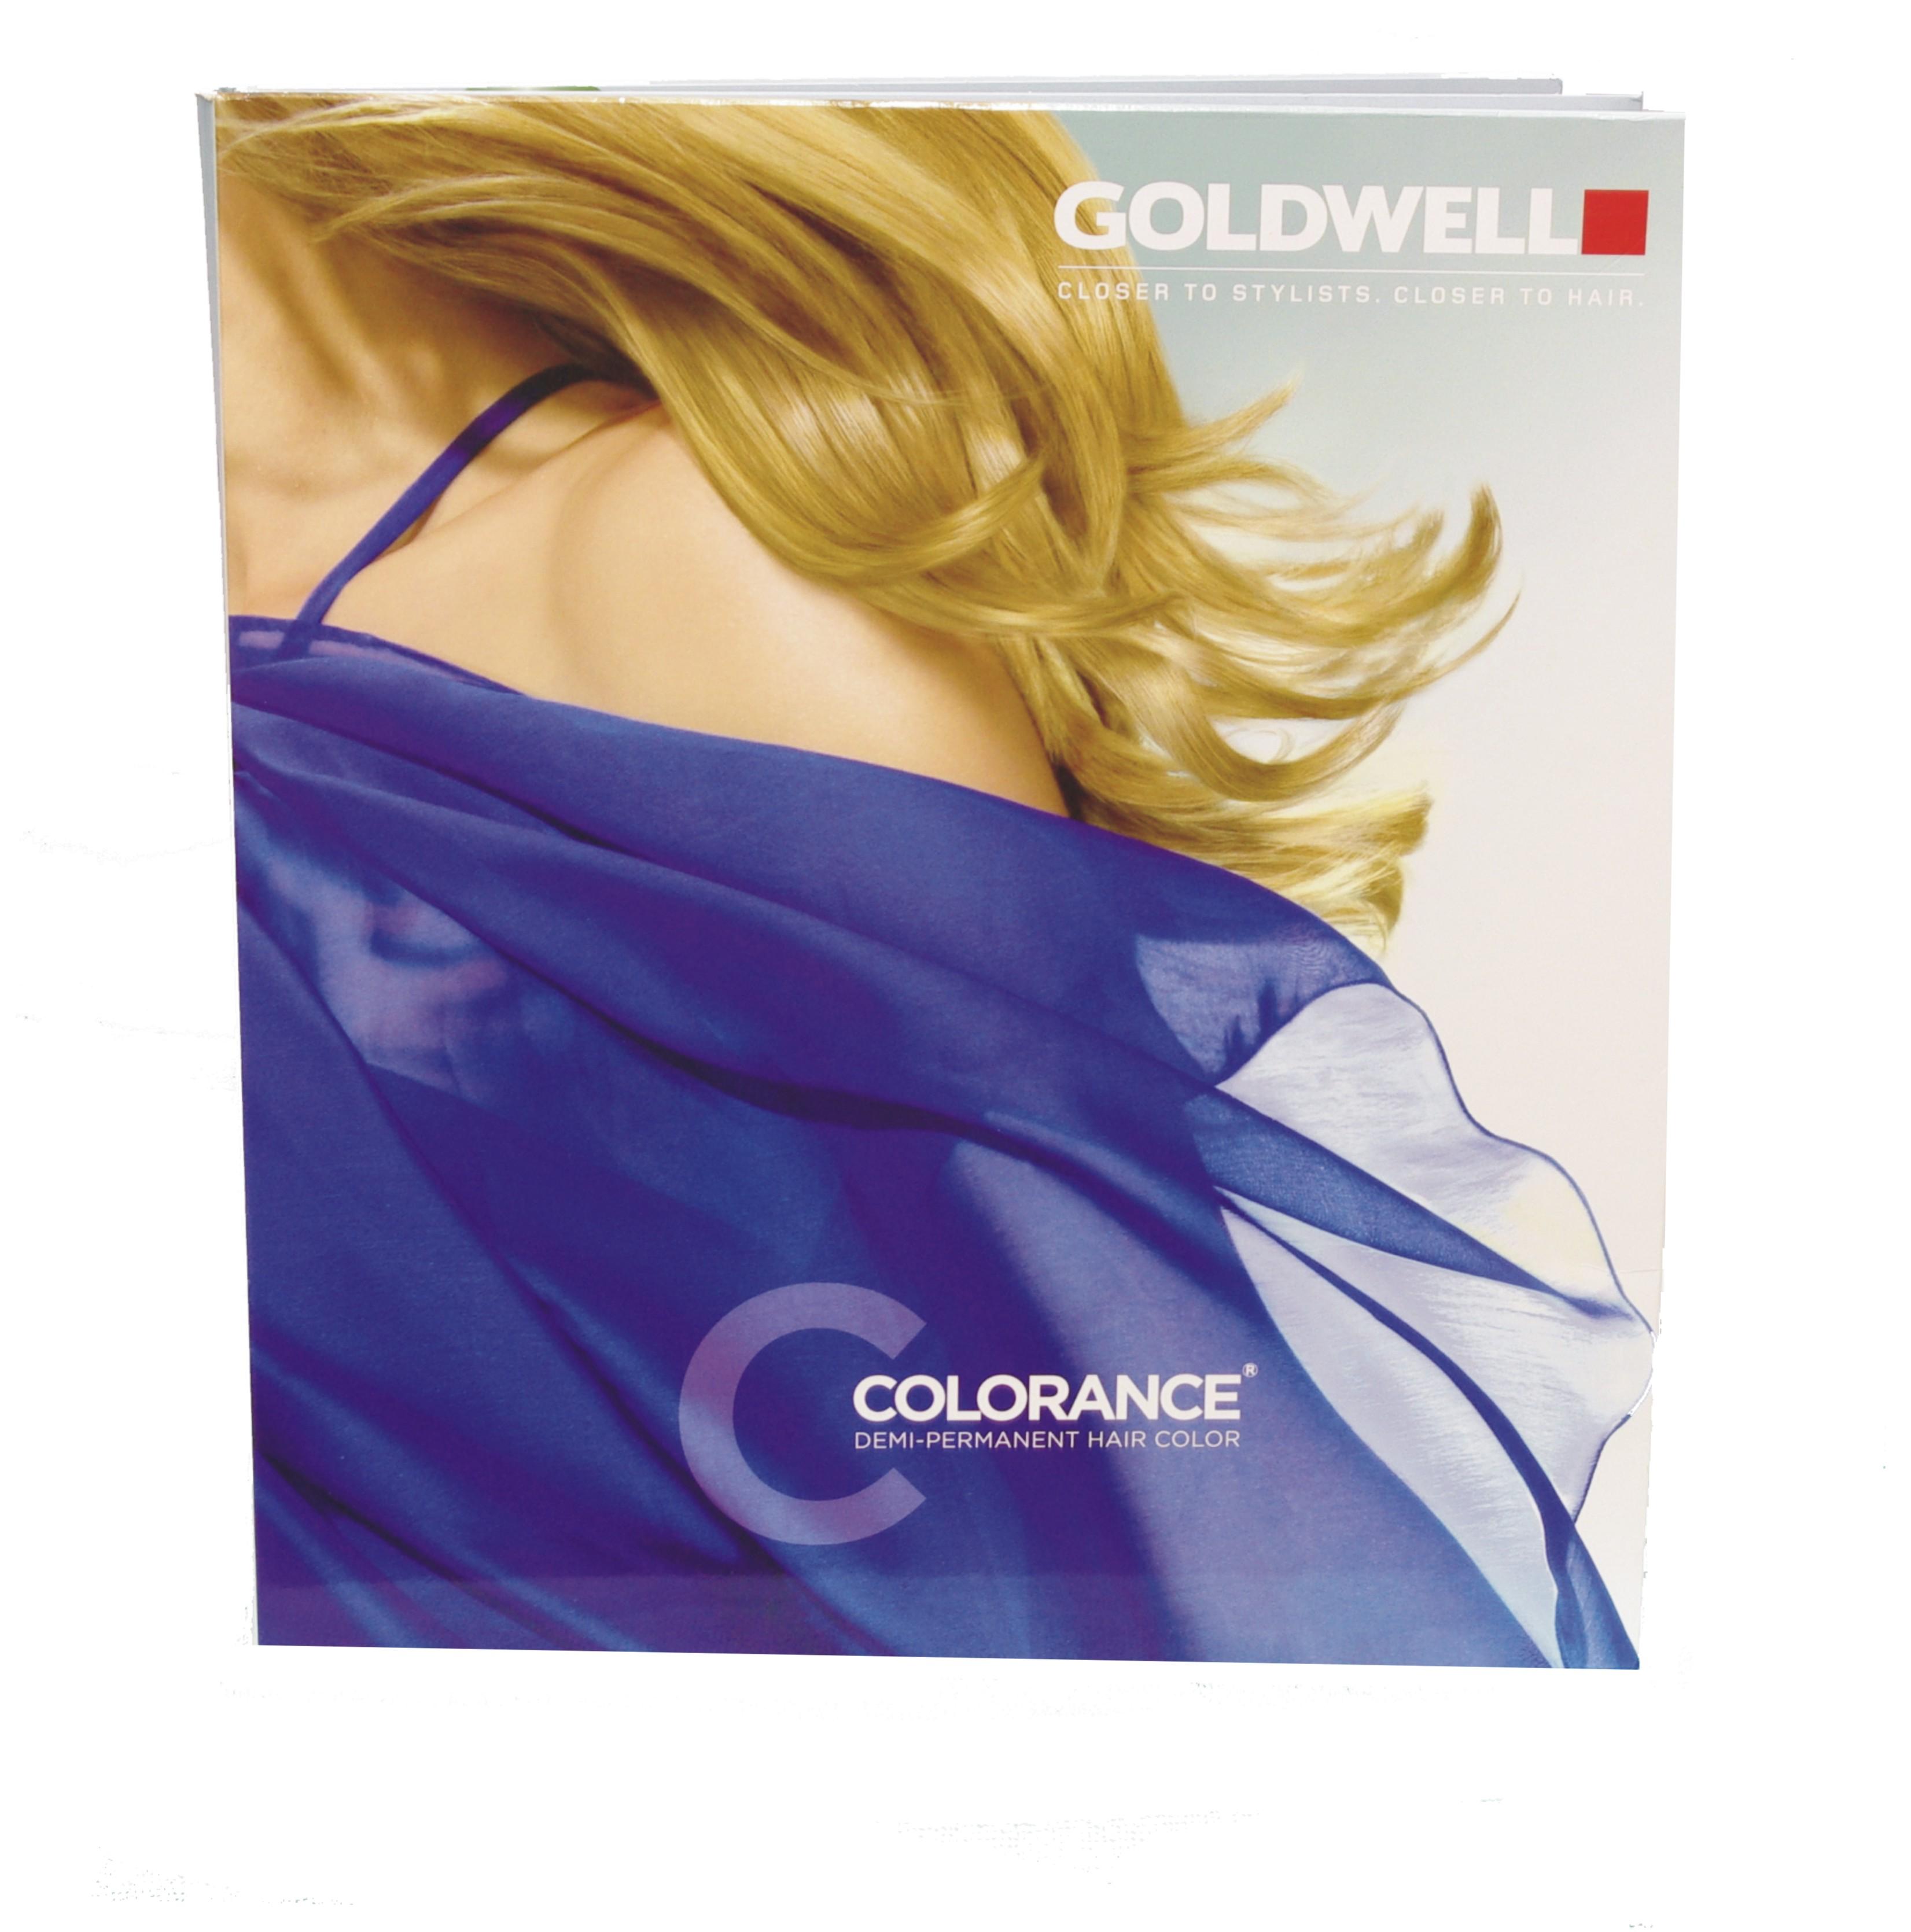 GOLDWELL Colorance Farbkarte